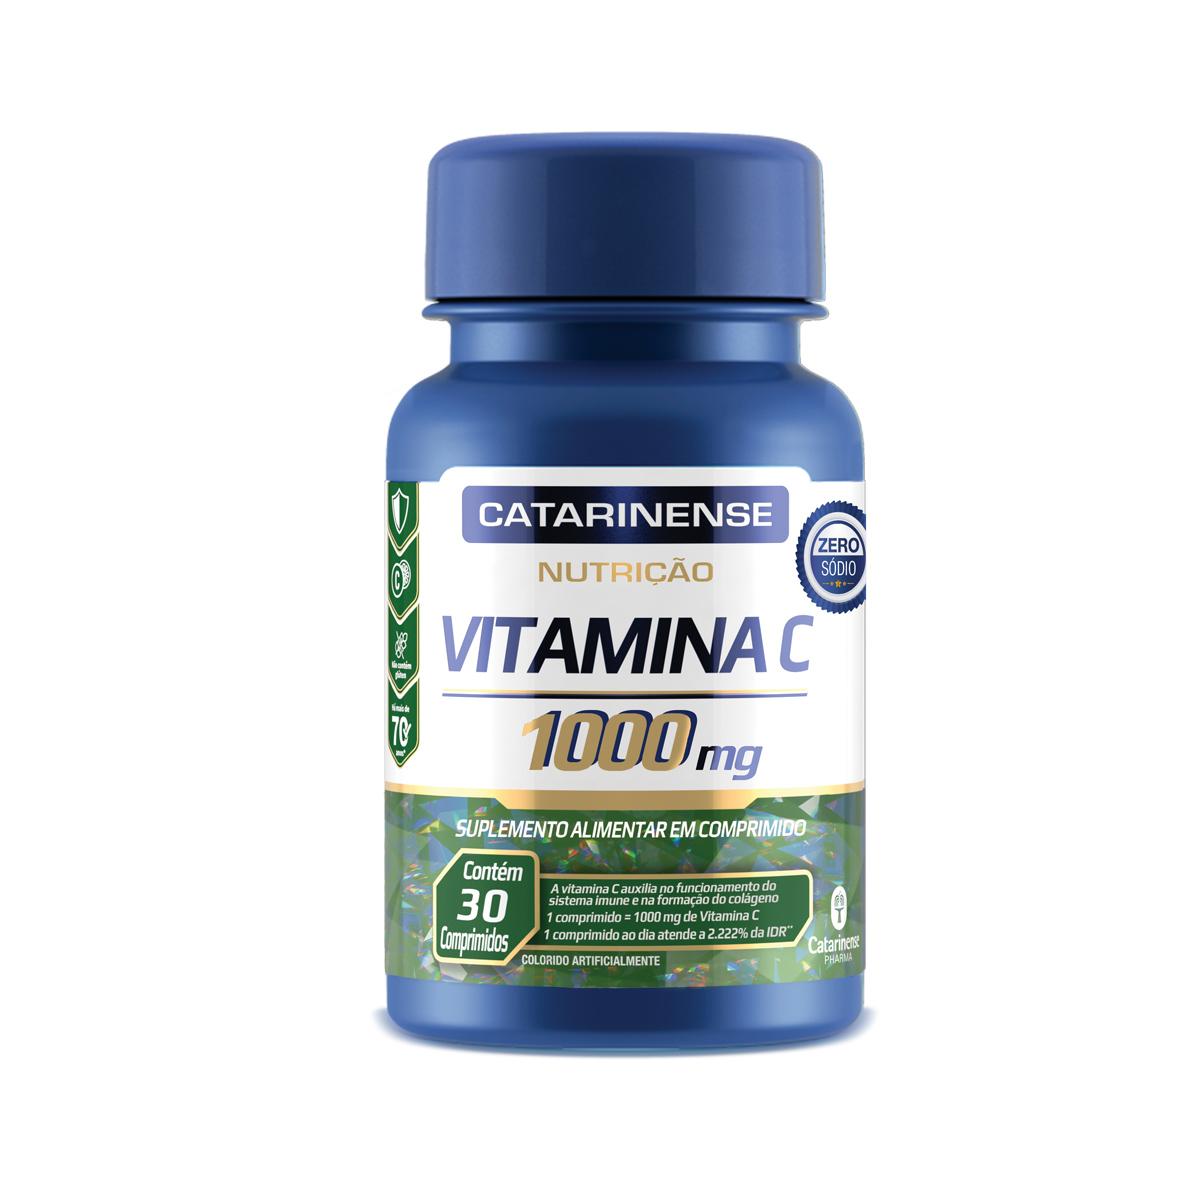 Vitamina C 1000mg 30 Comprimidos - Catarinense